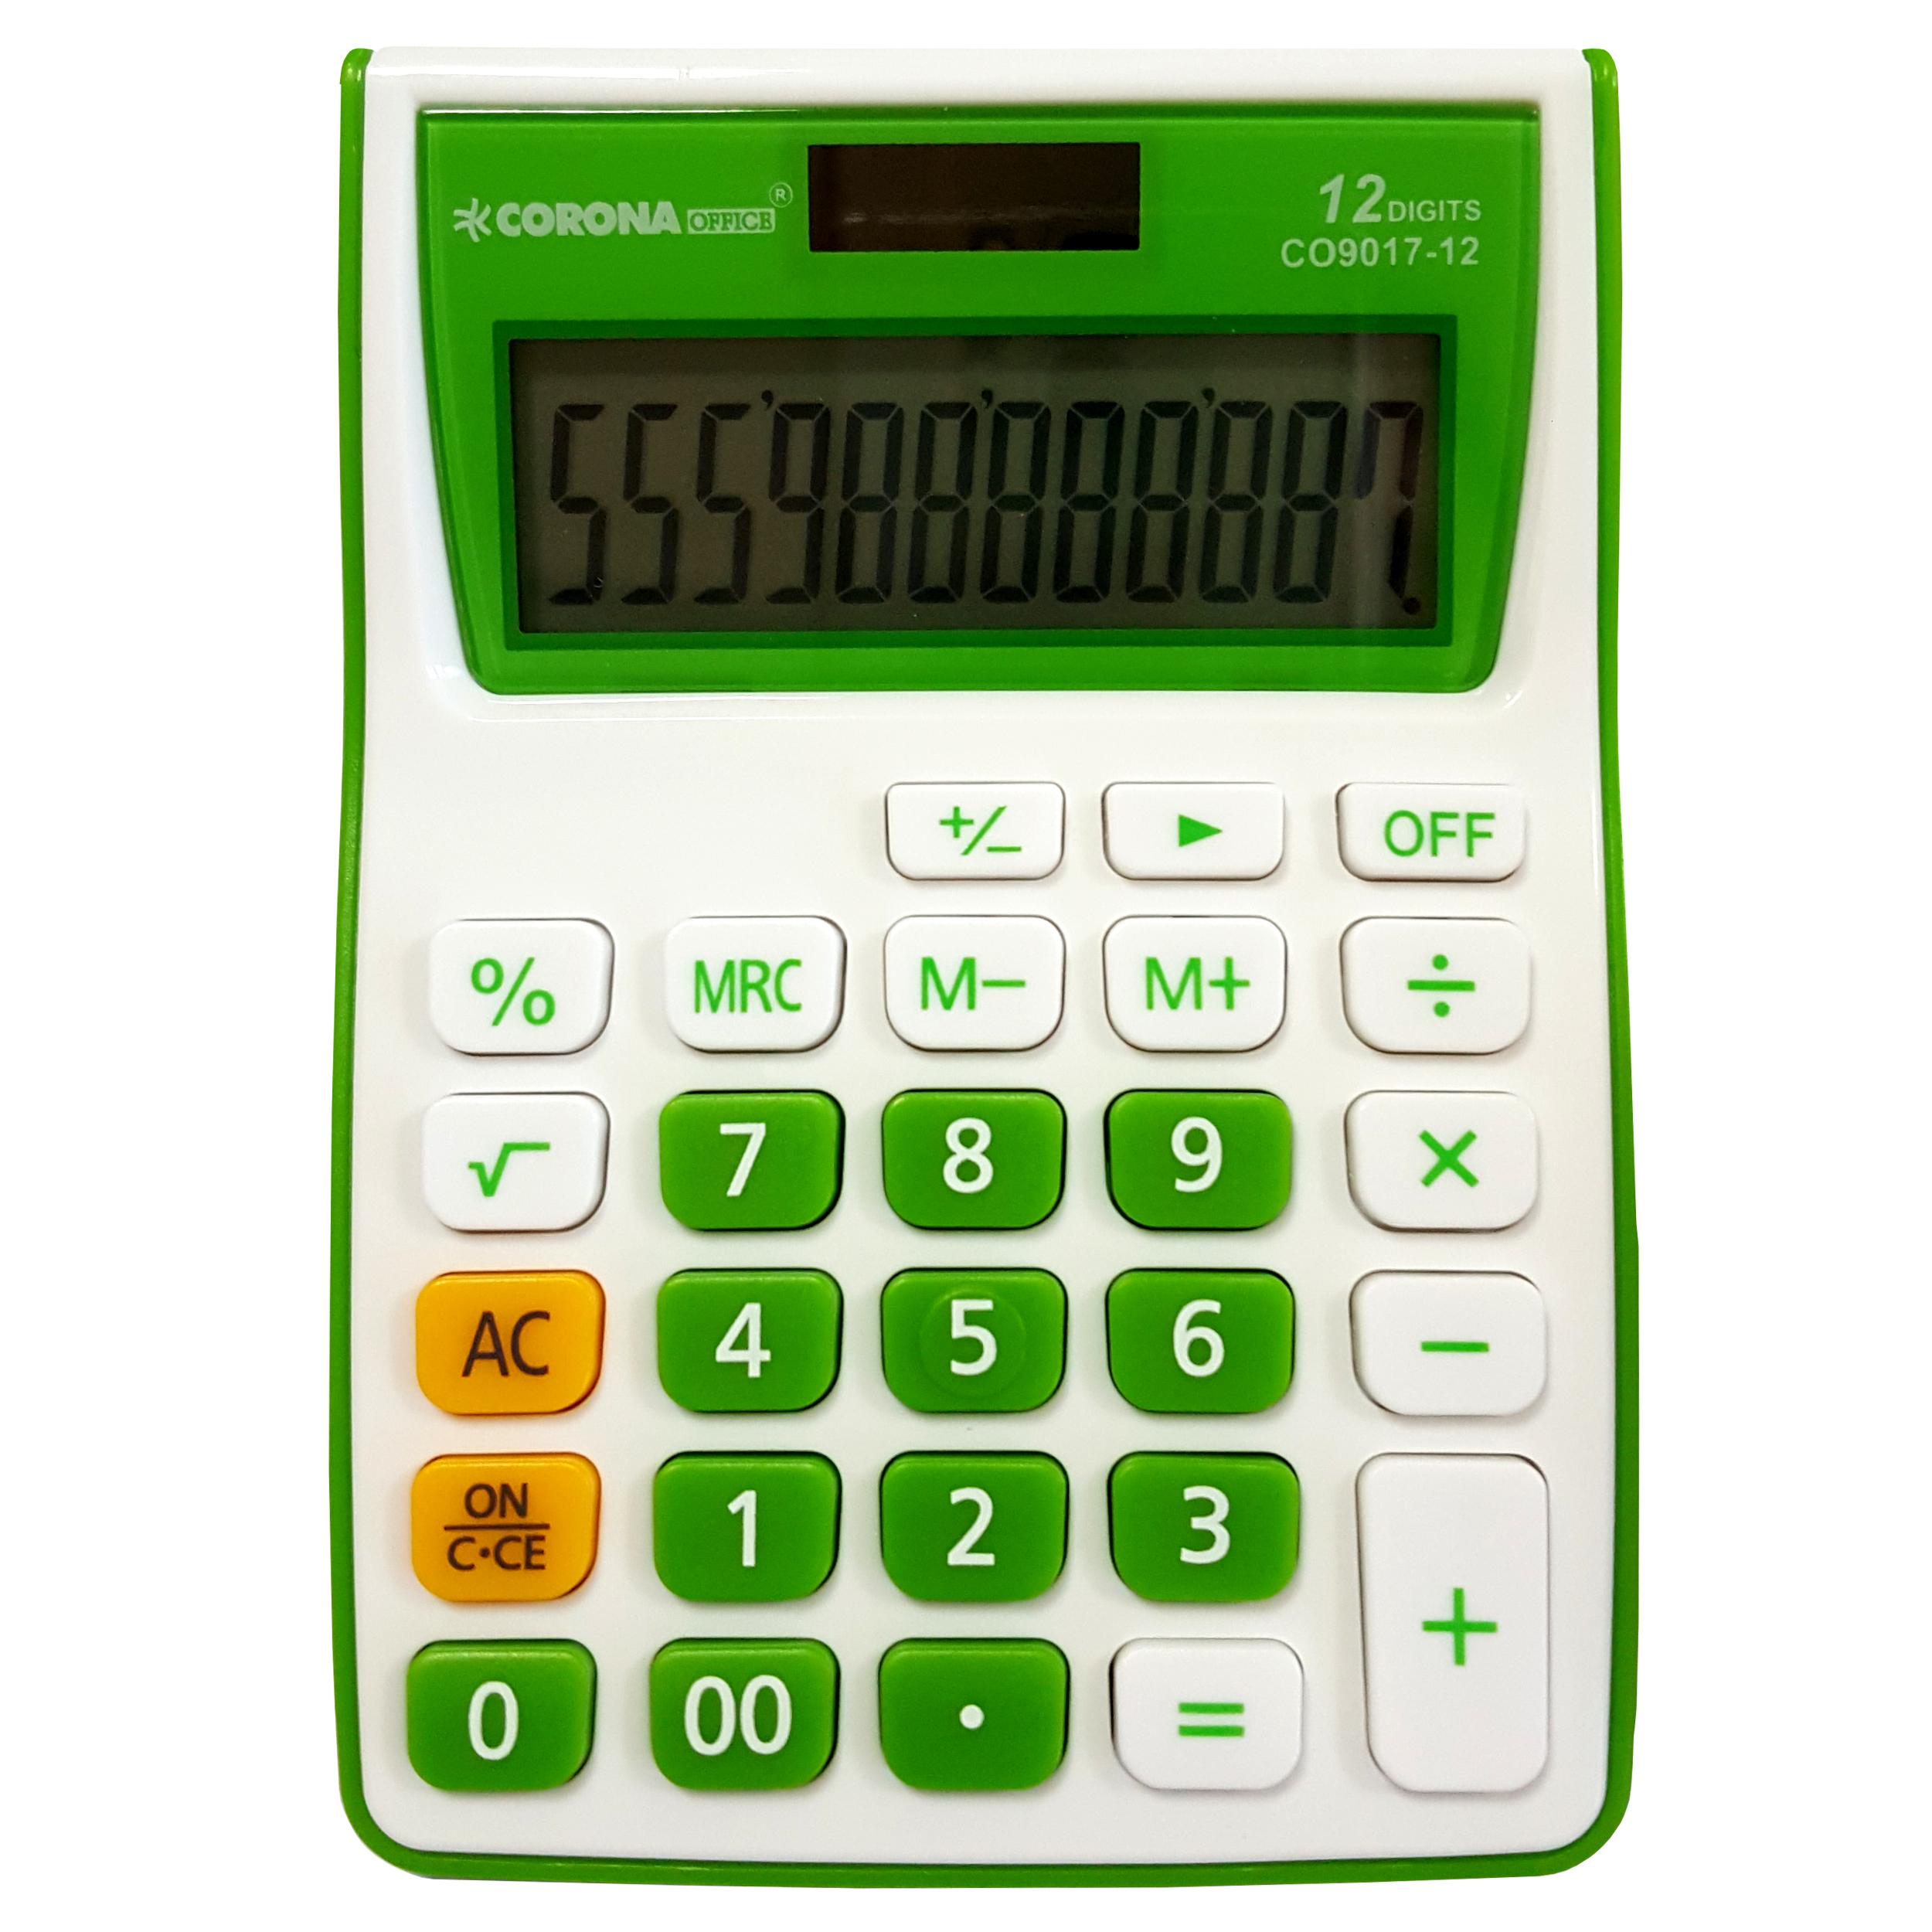 ماشین حساب کرونا آفیس مدل CO9017